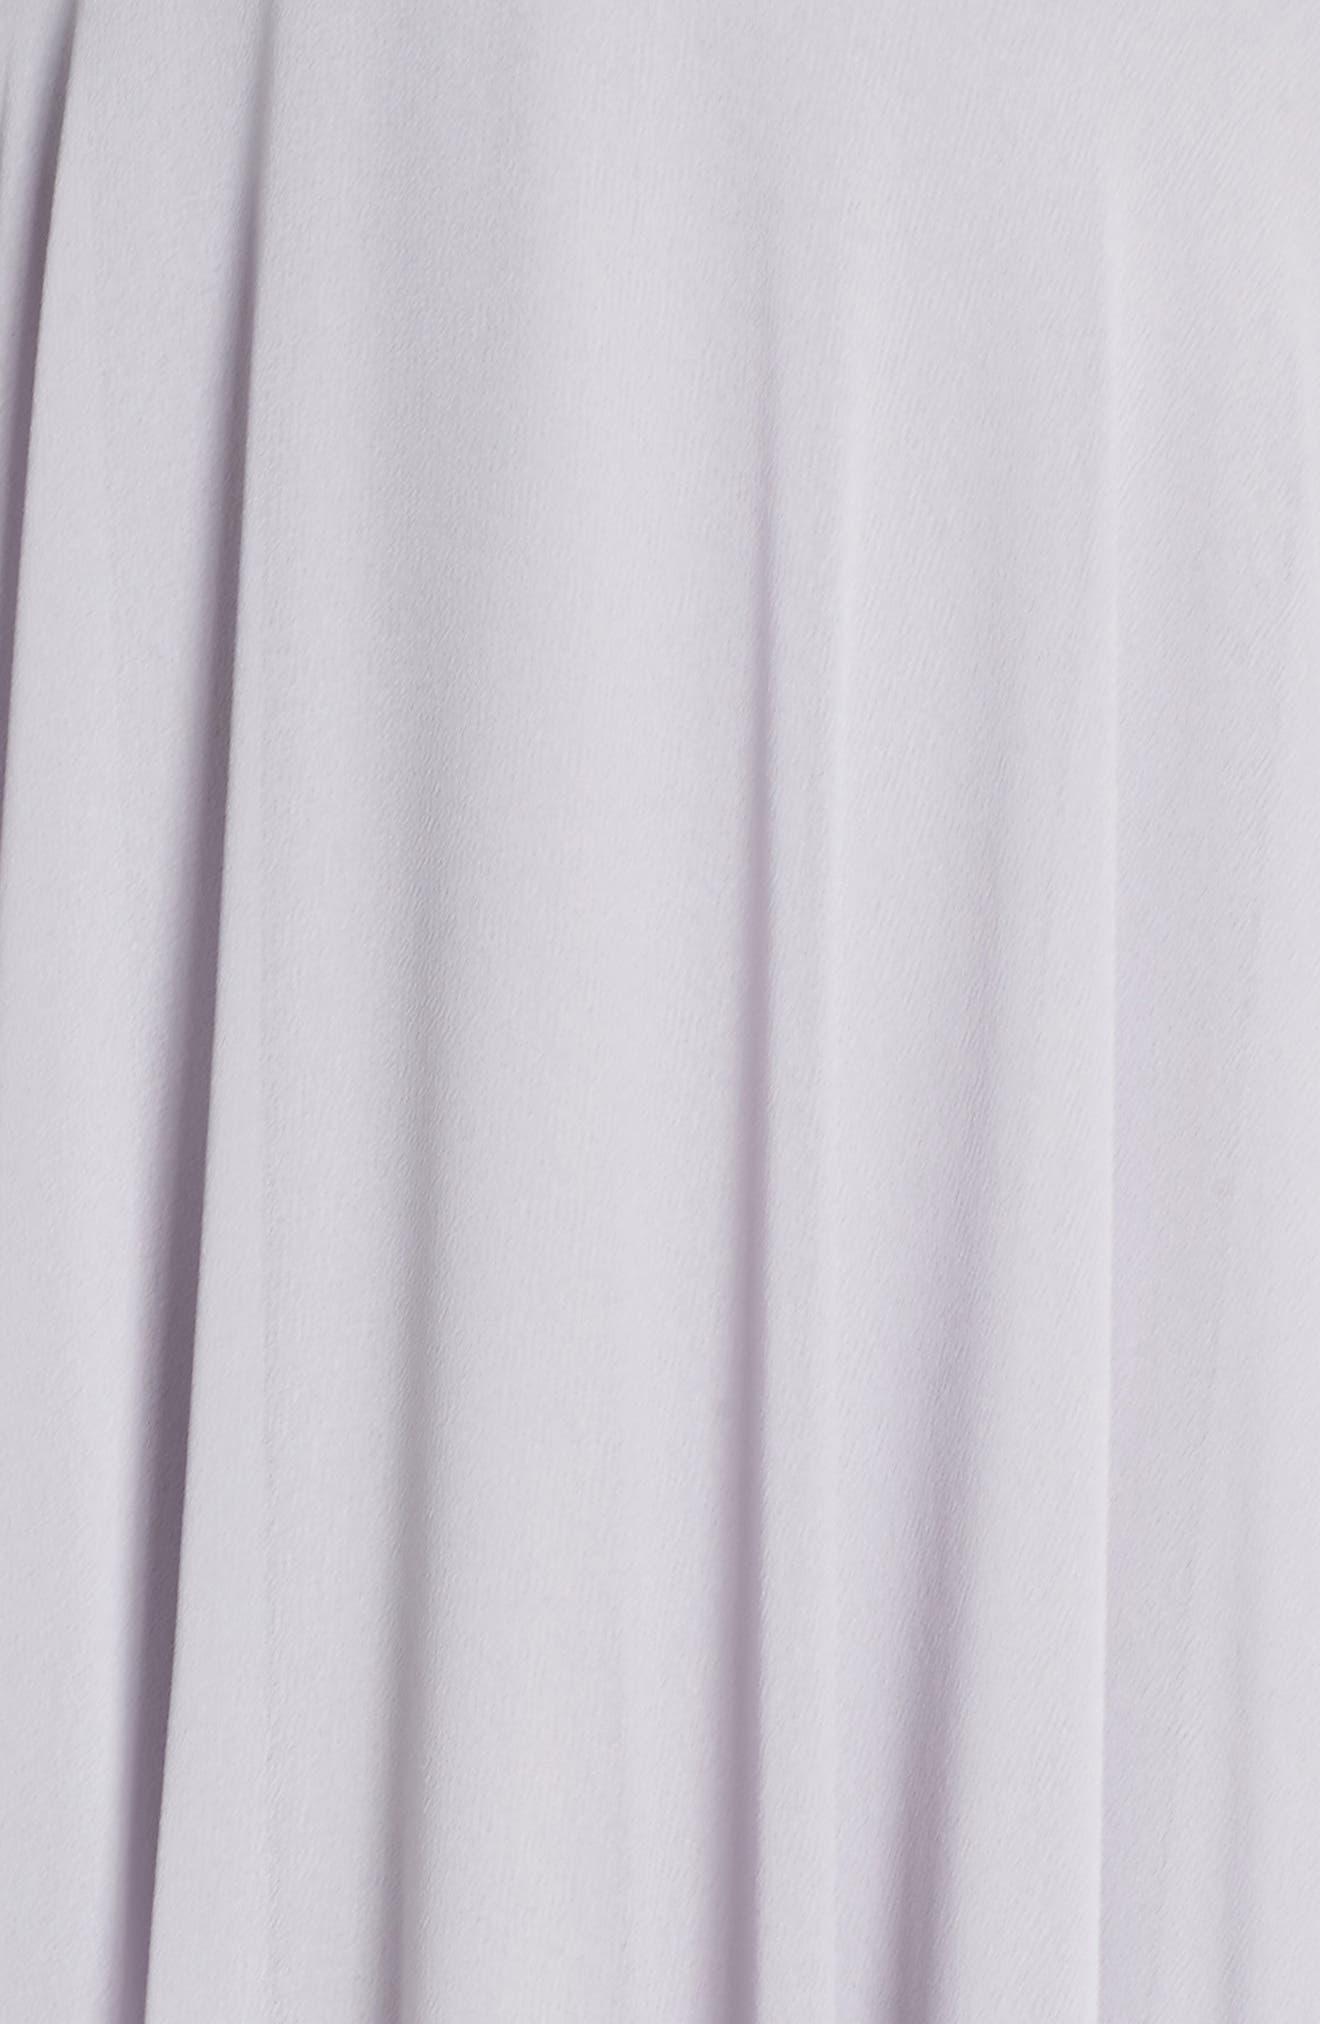 Celebrate the Moment Lace Trim Chiffon Maxi Dress,                             Alternate thumbnail 5, color,                             020